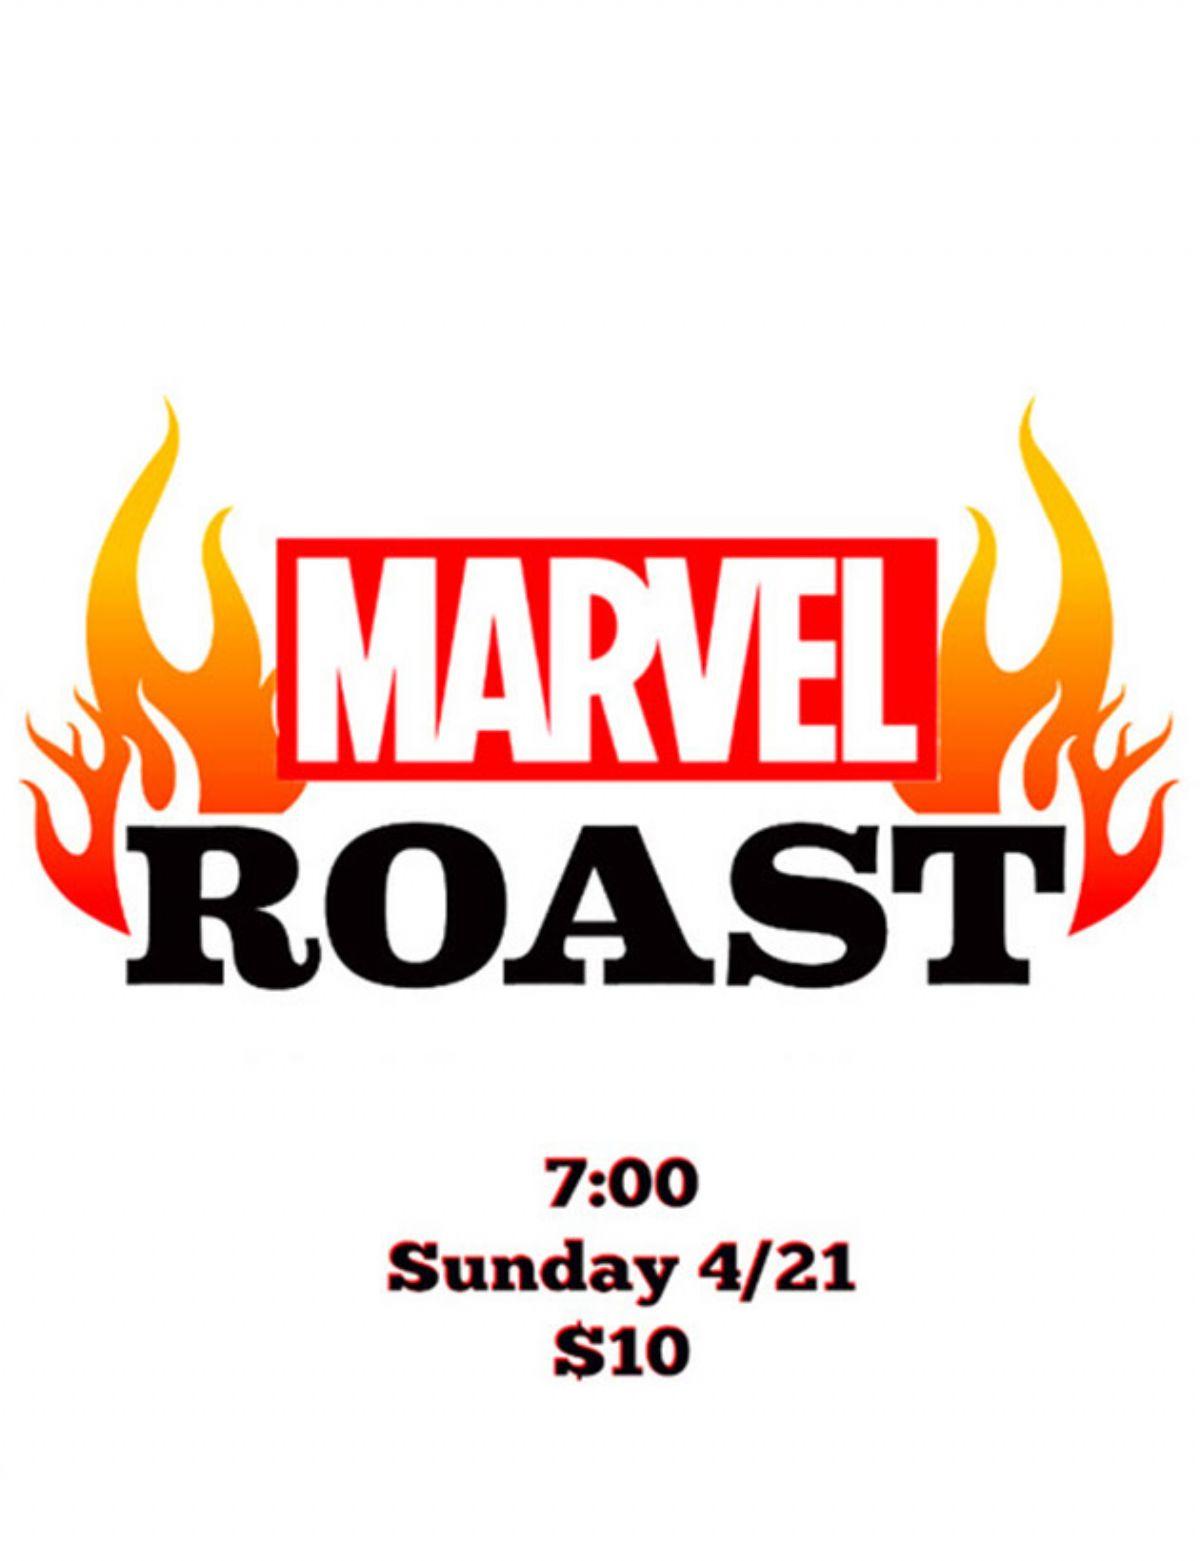 marvel roast flyer.jpg